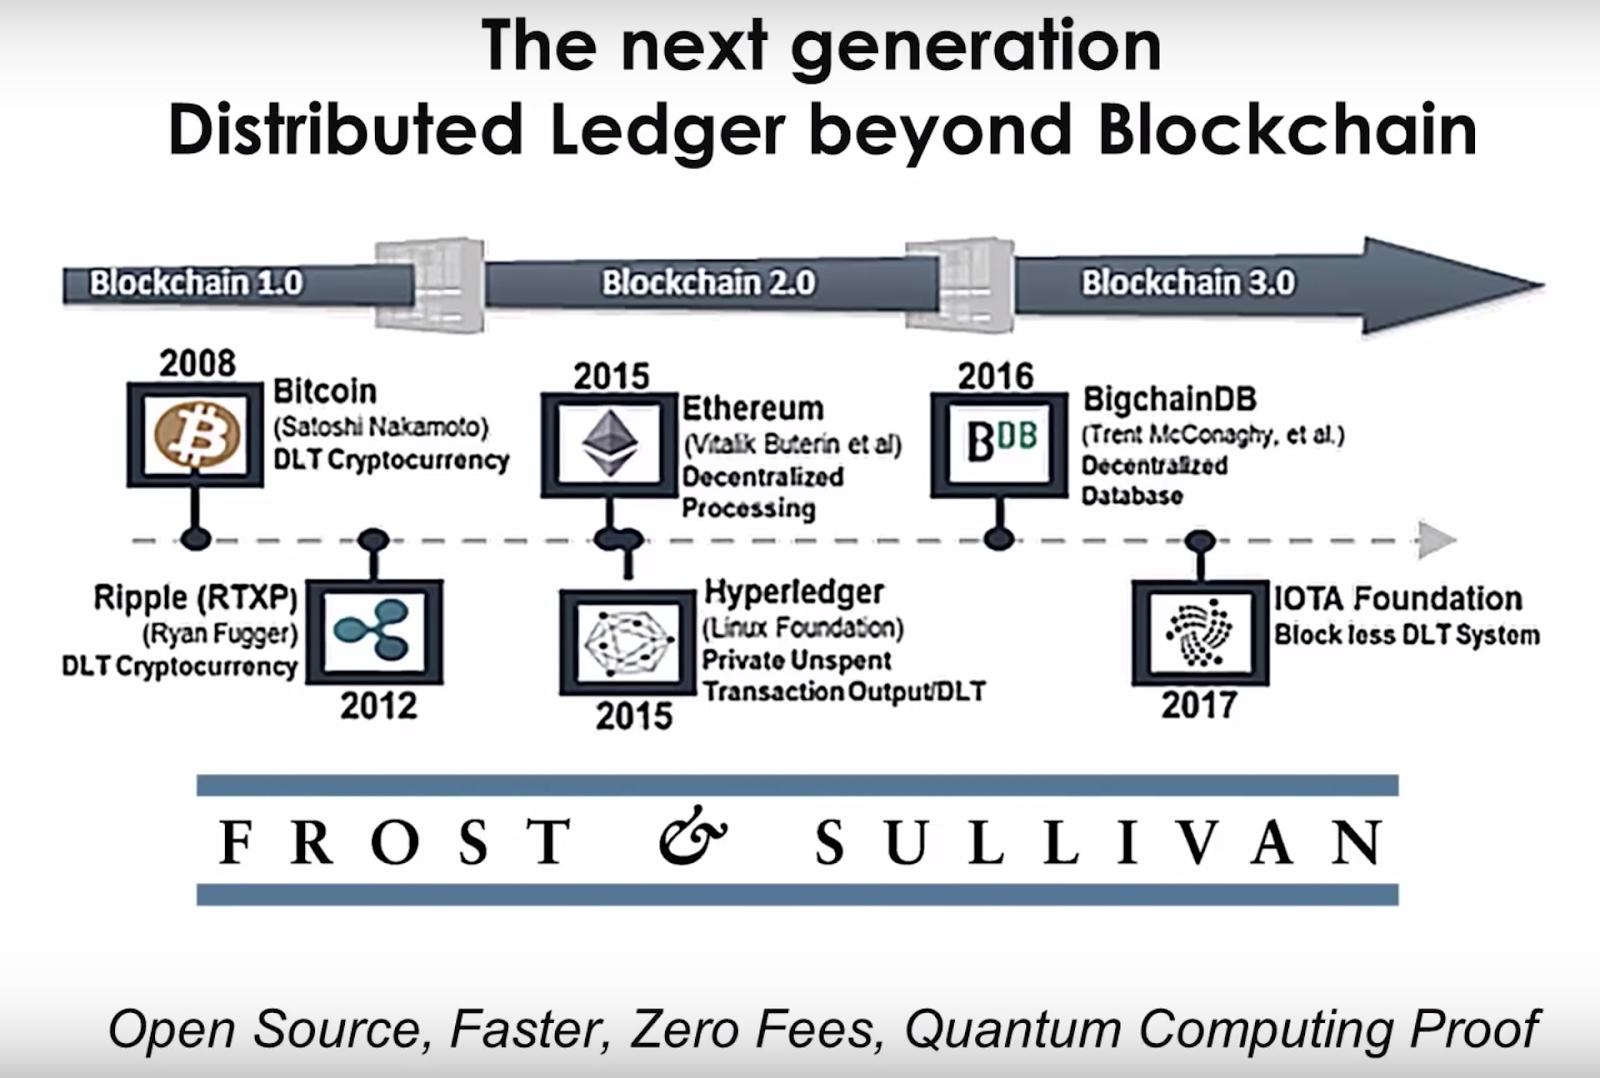 The Next Generation Distributed Ledger beyond Blockchain